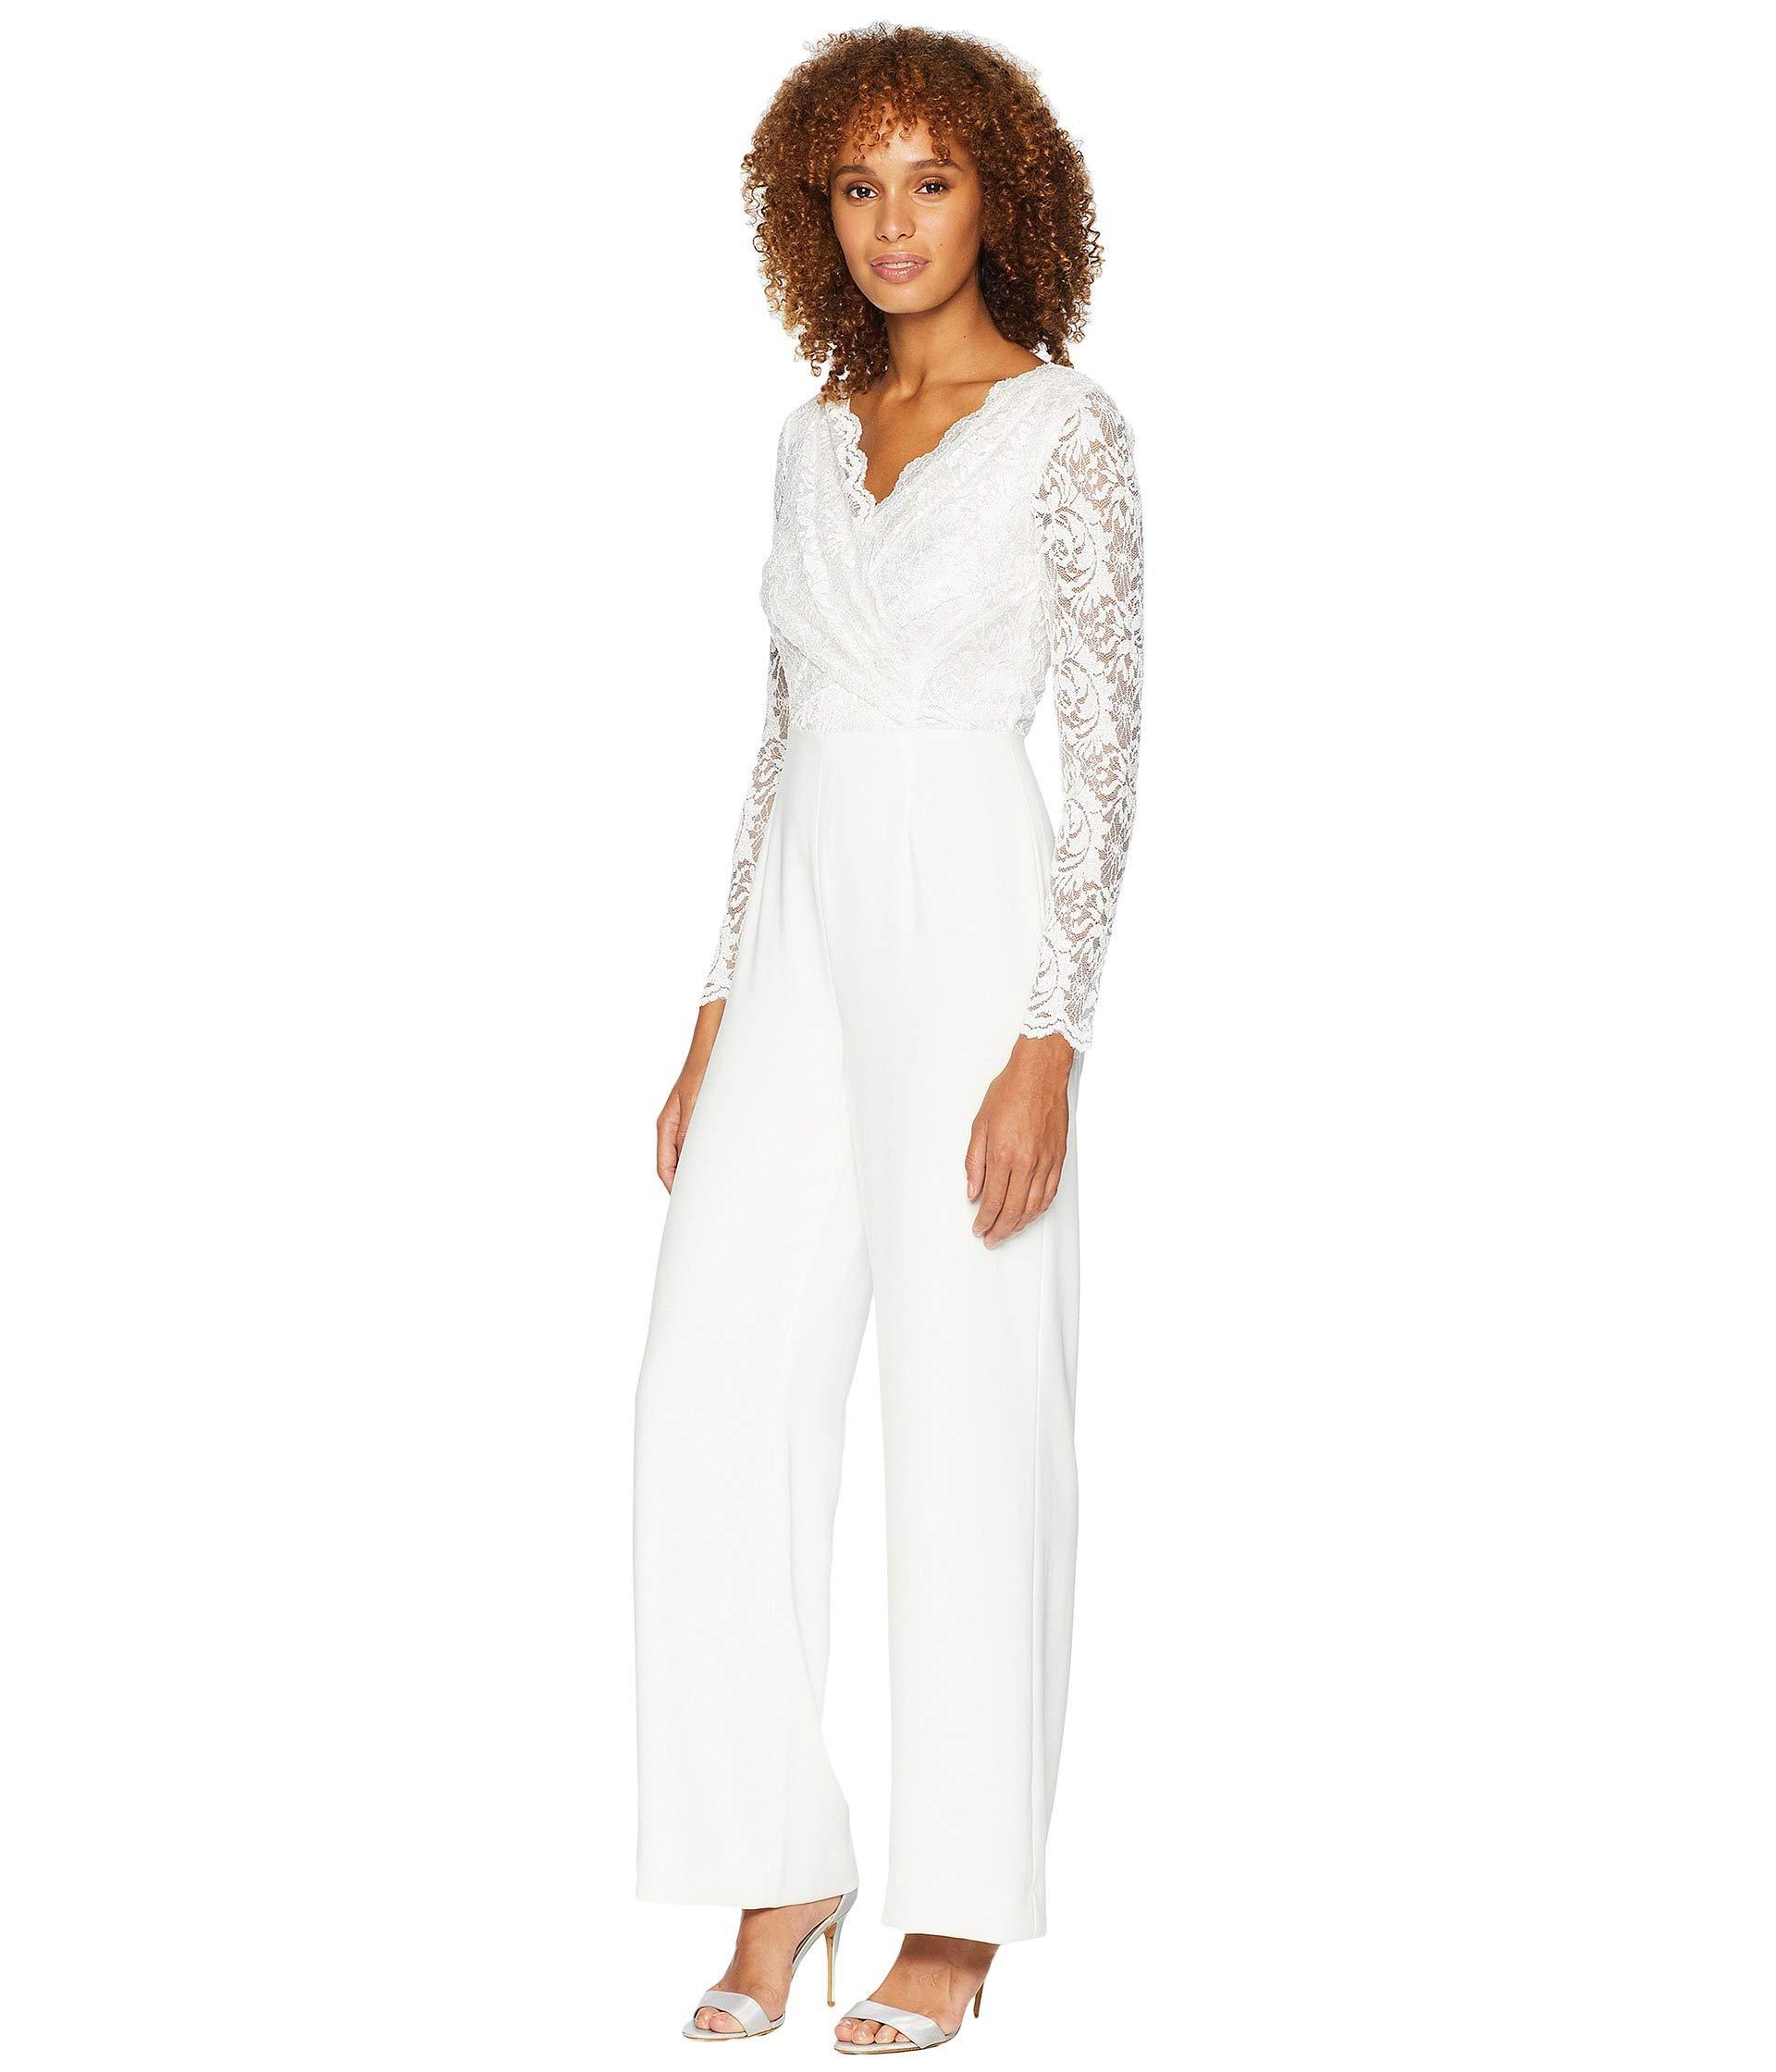 82e66c890c51e White Long Sleeve V Neck Jumpsuit